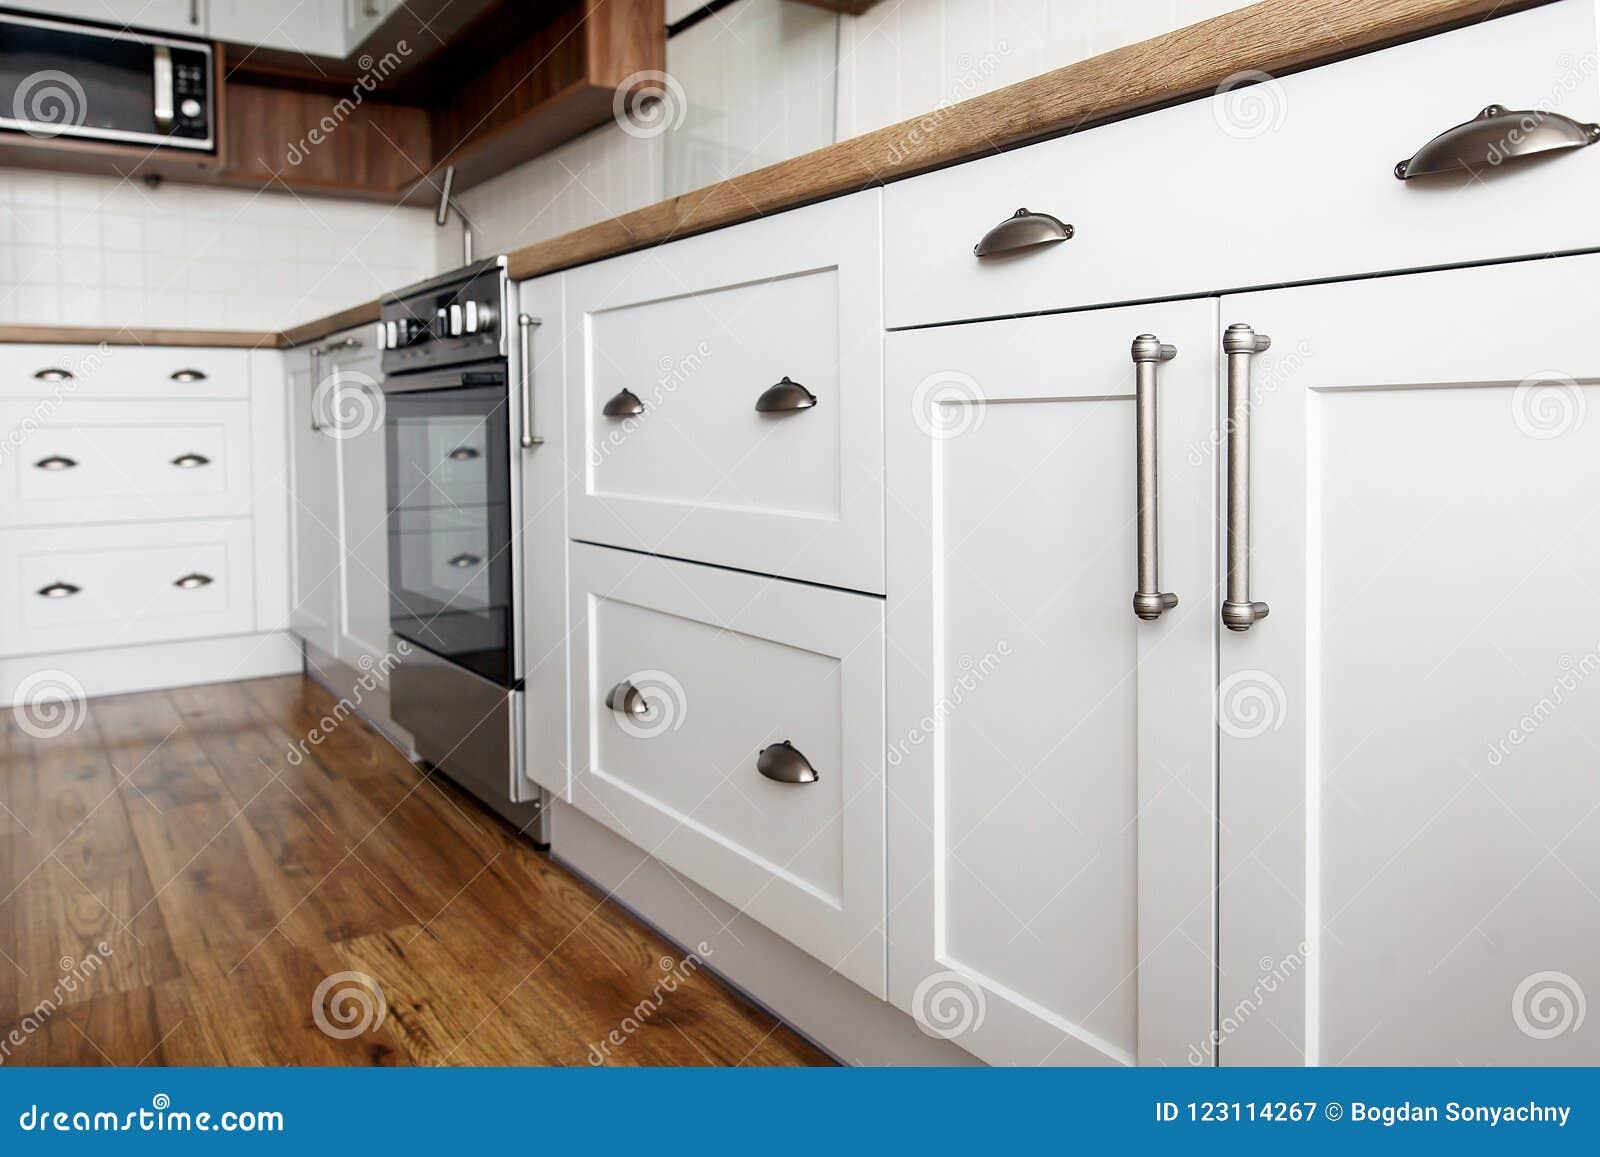 Stylish Light Gray Handles On Cabinets Close Up Kitchen Interior